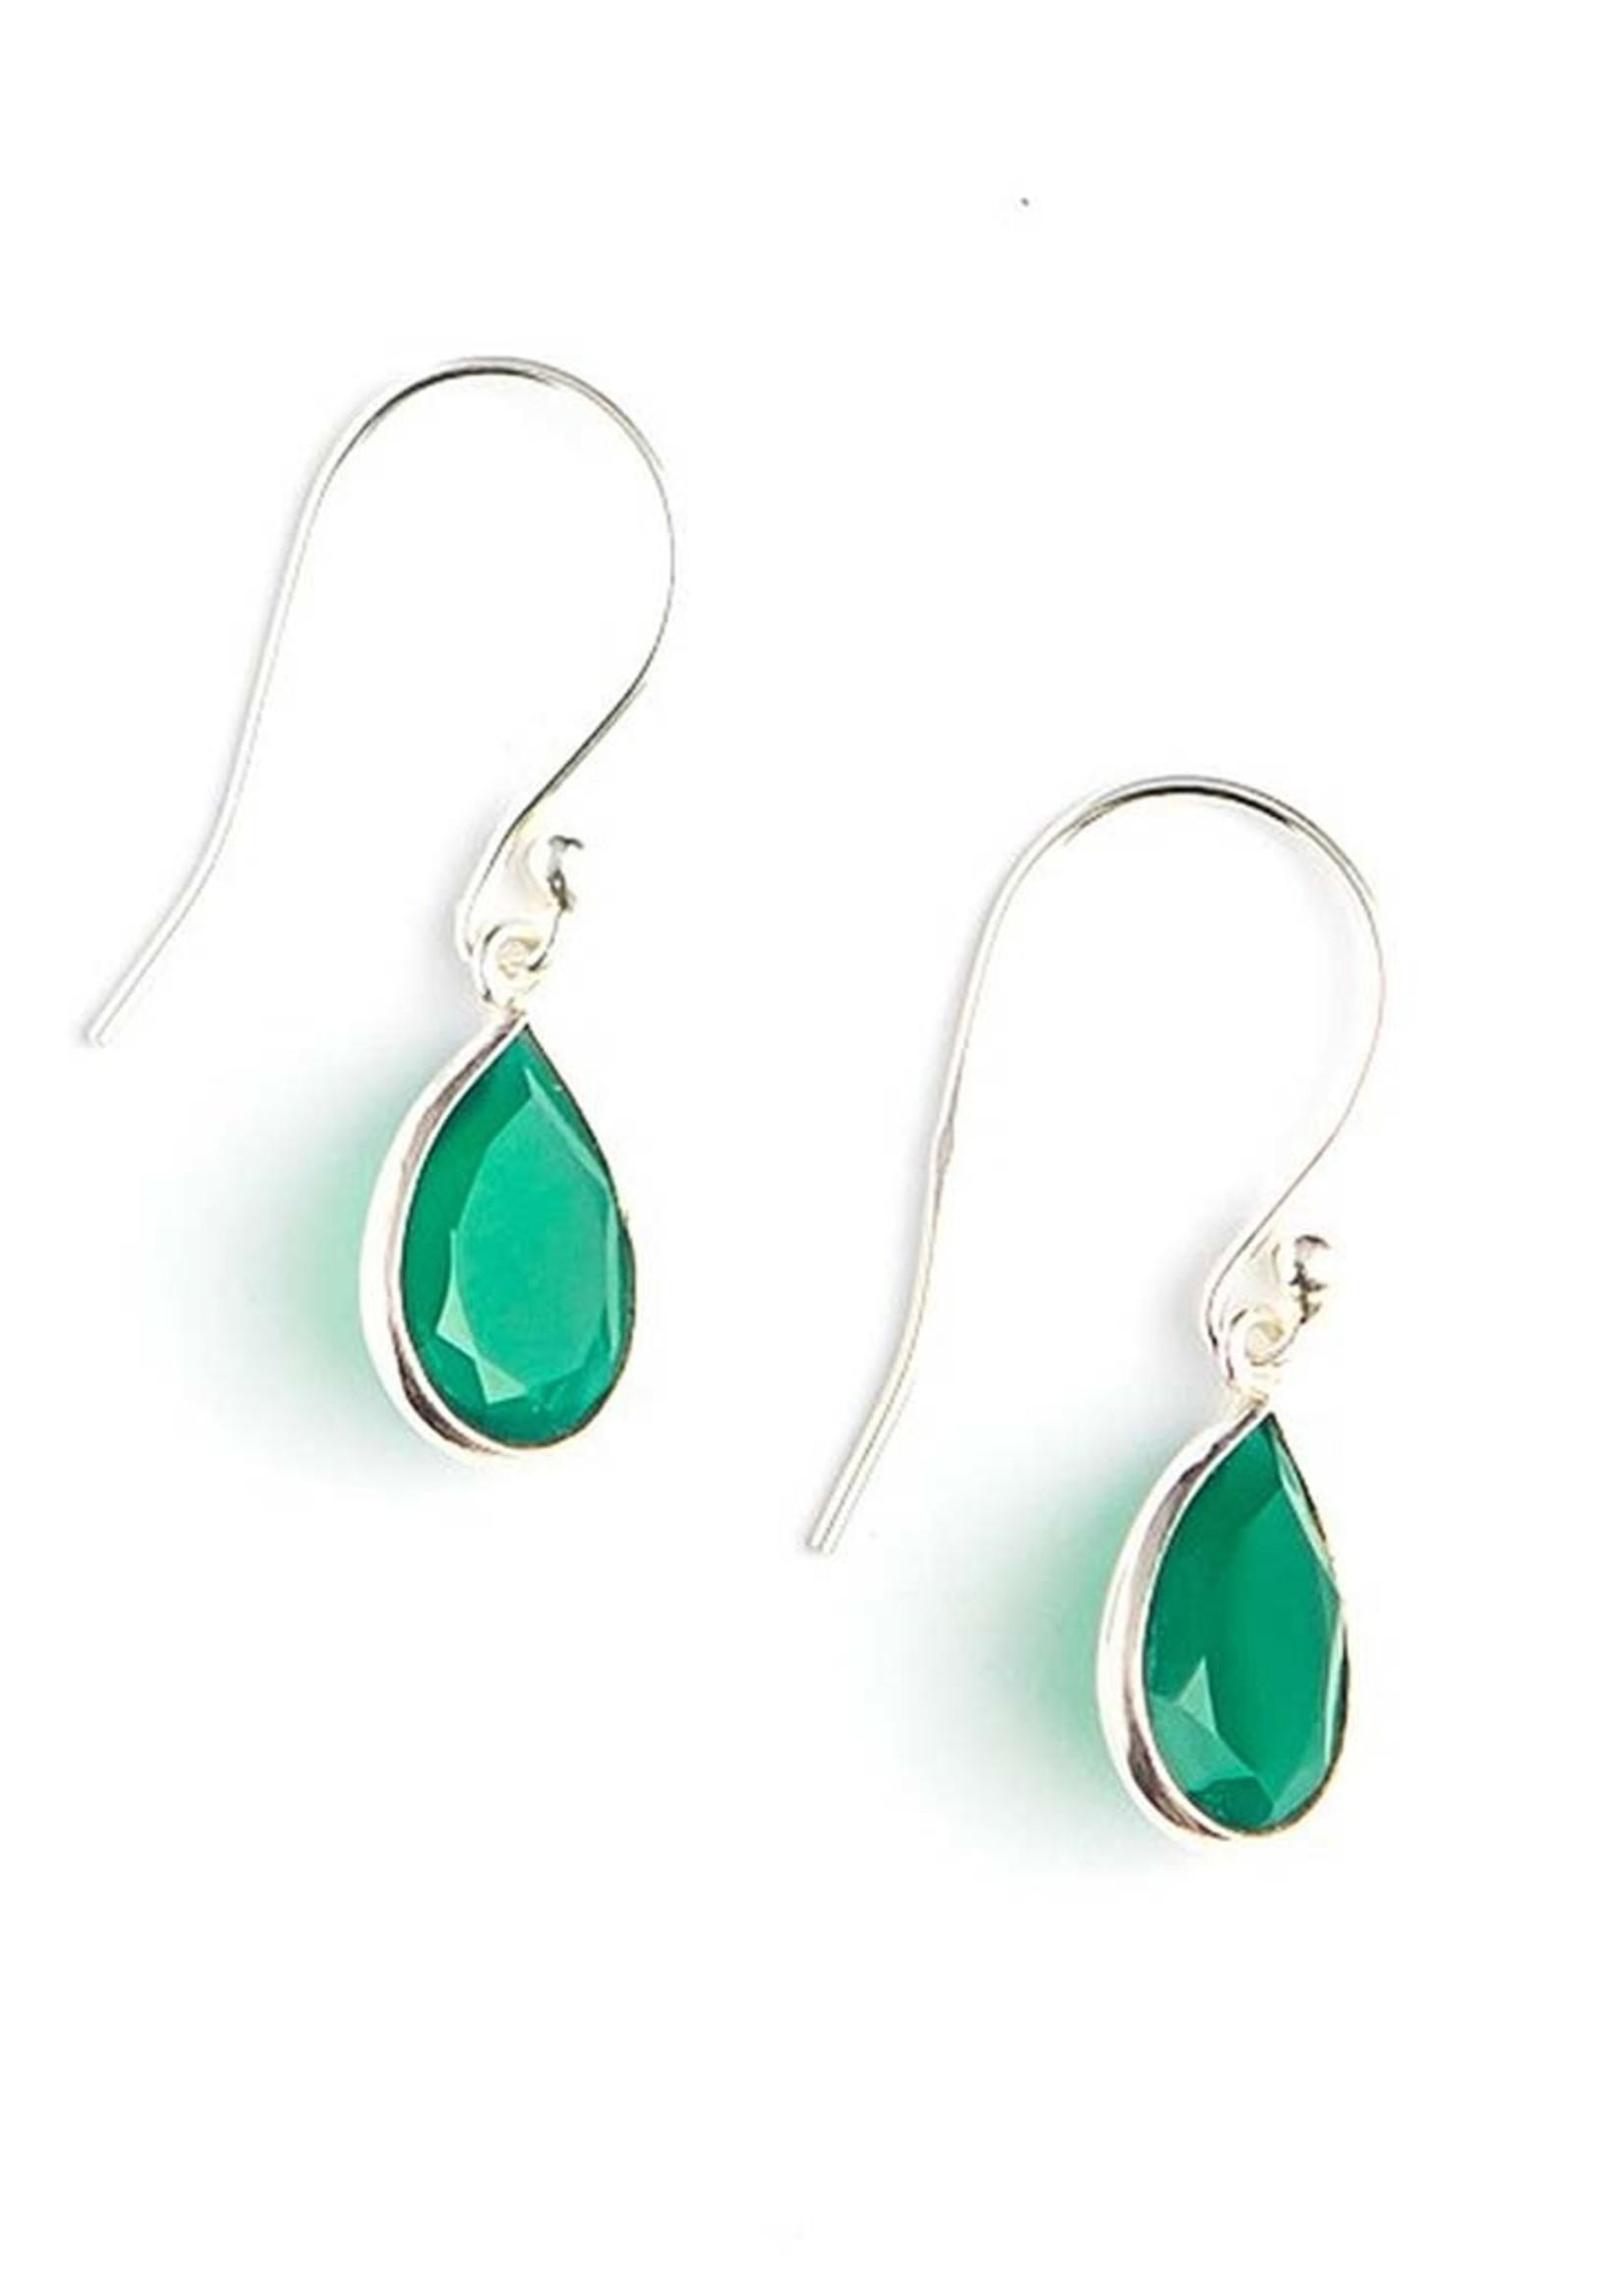 Raindrop Green Onyx Earrings